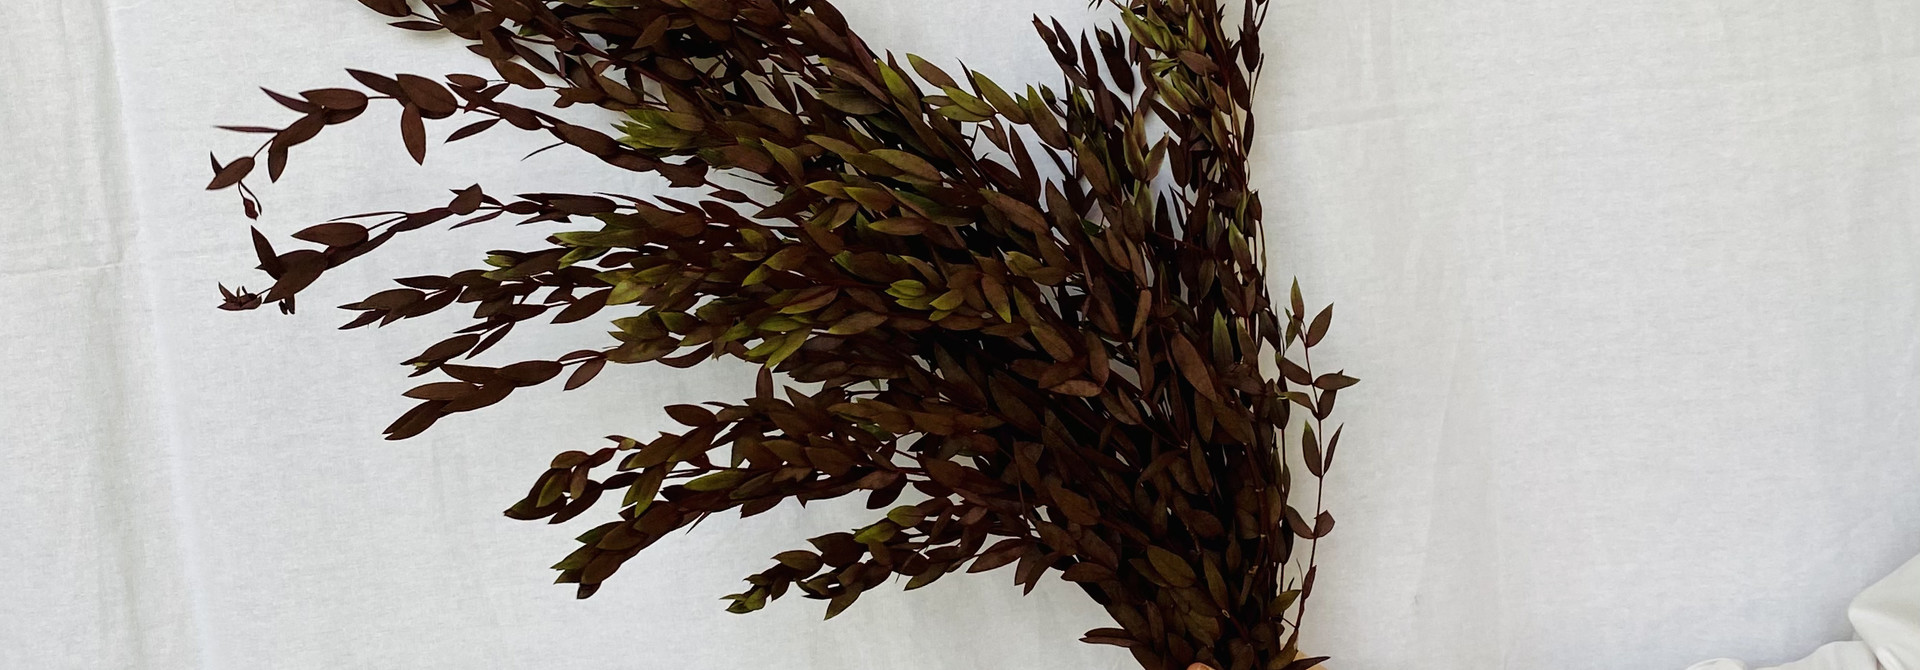 Gepreserveerde Eucalyptus - rood